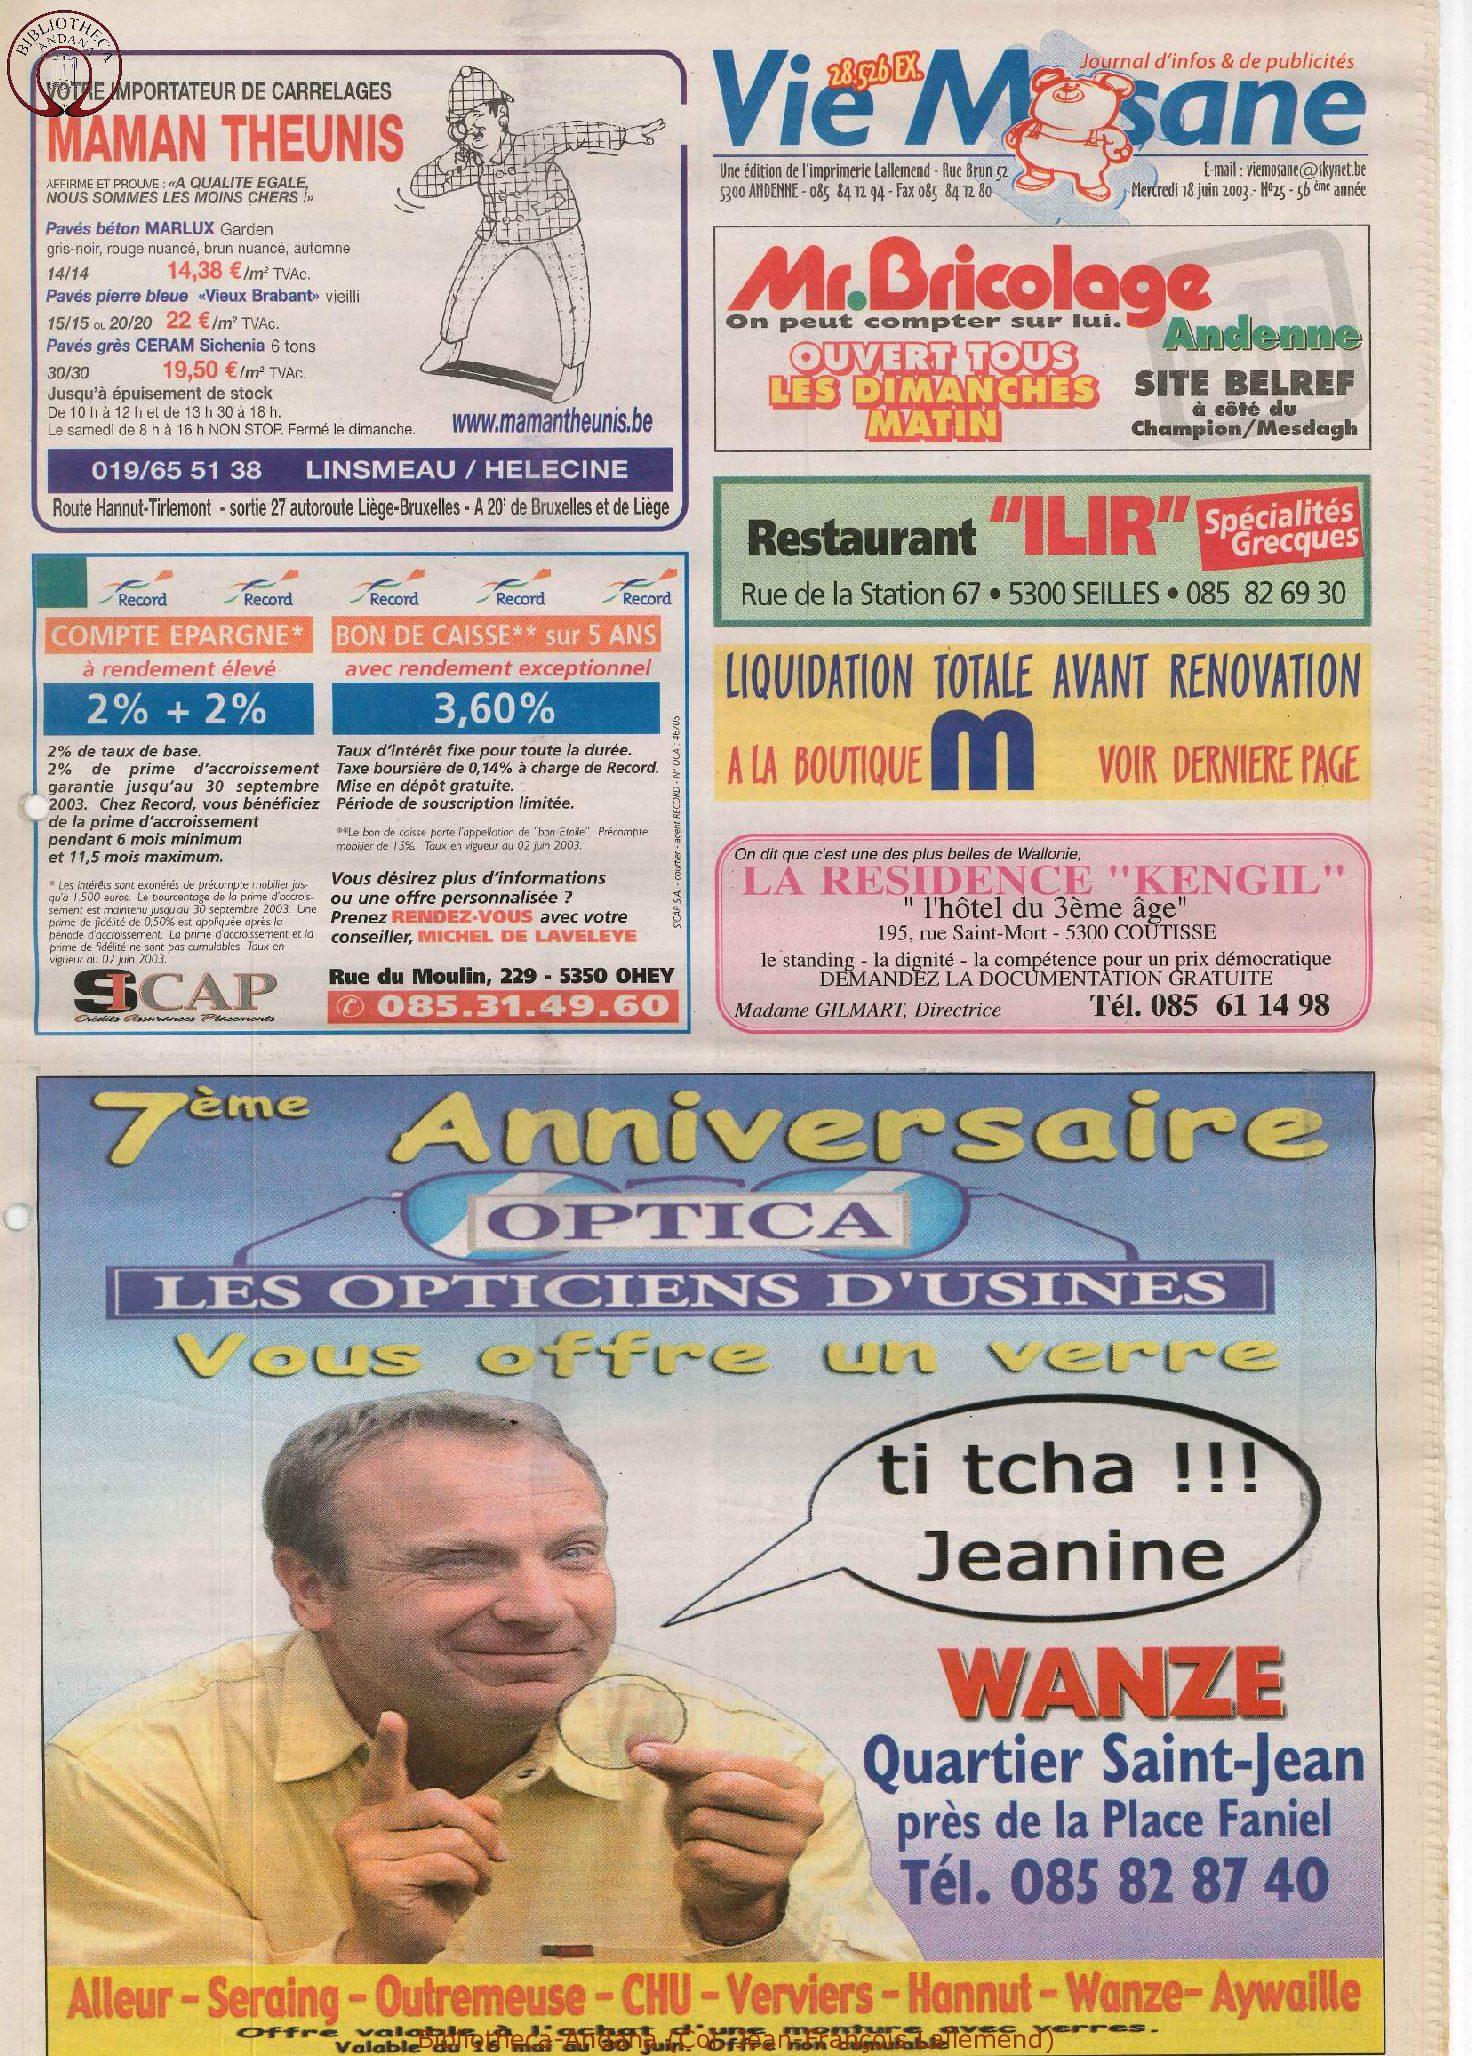 57e année - n°25 - 18 juin 2003